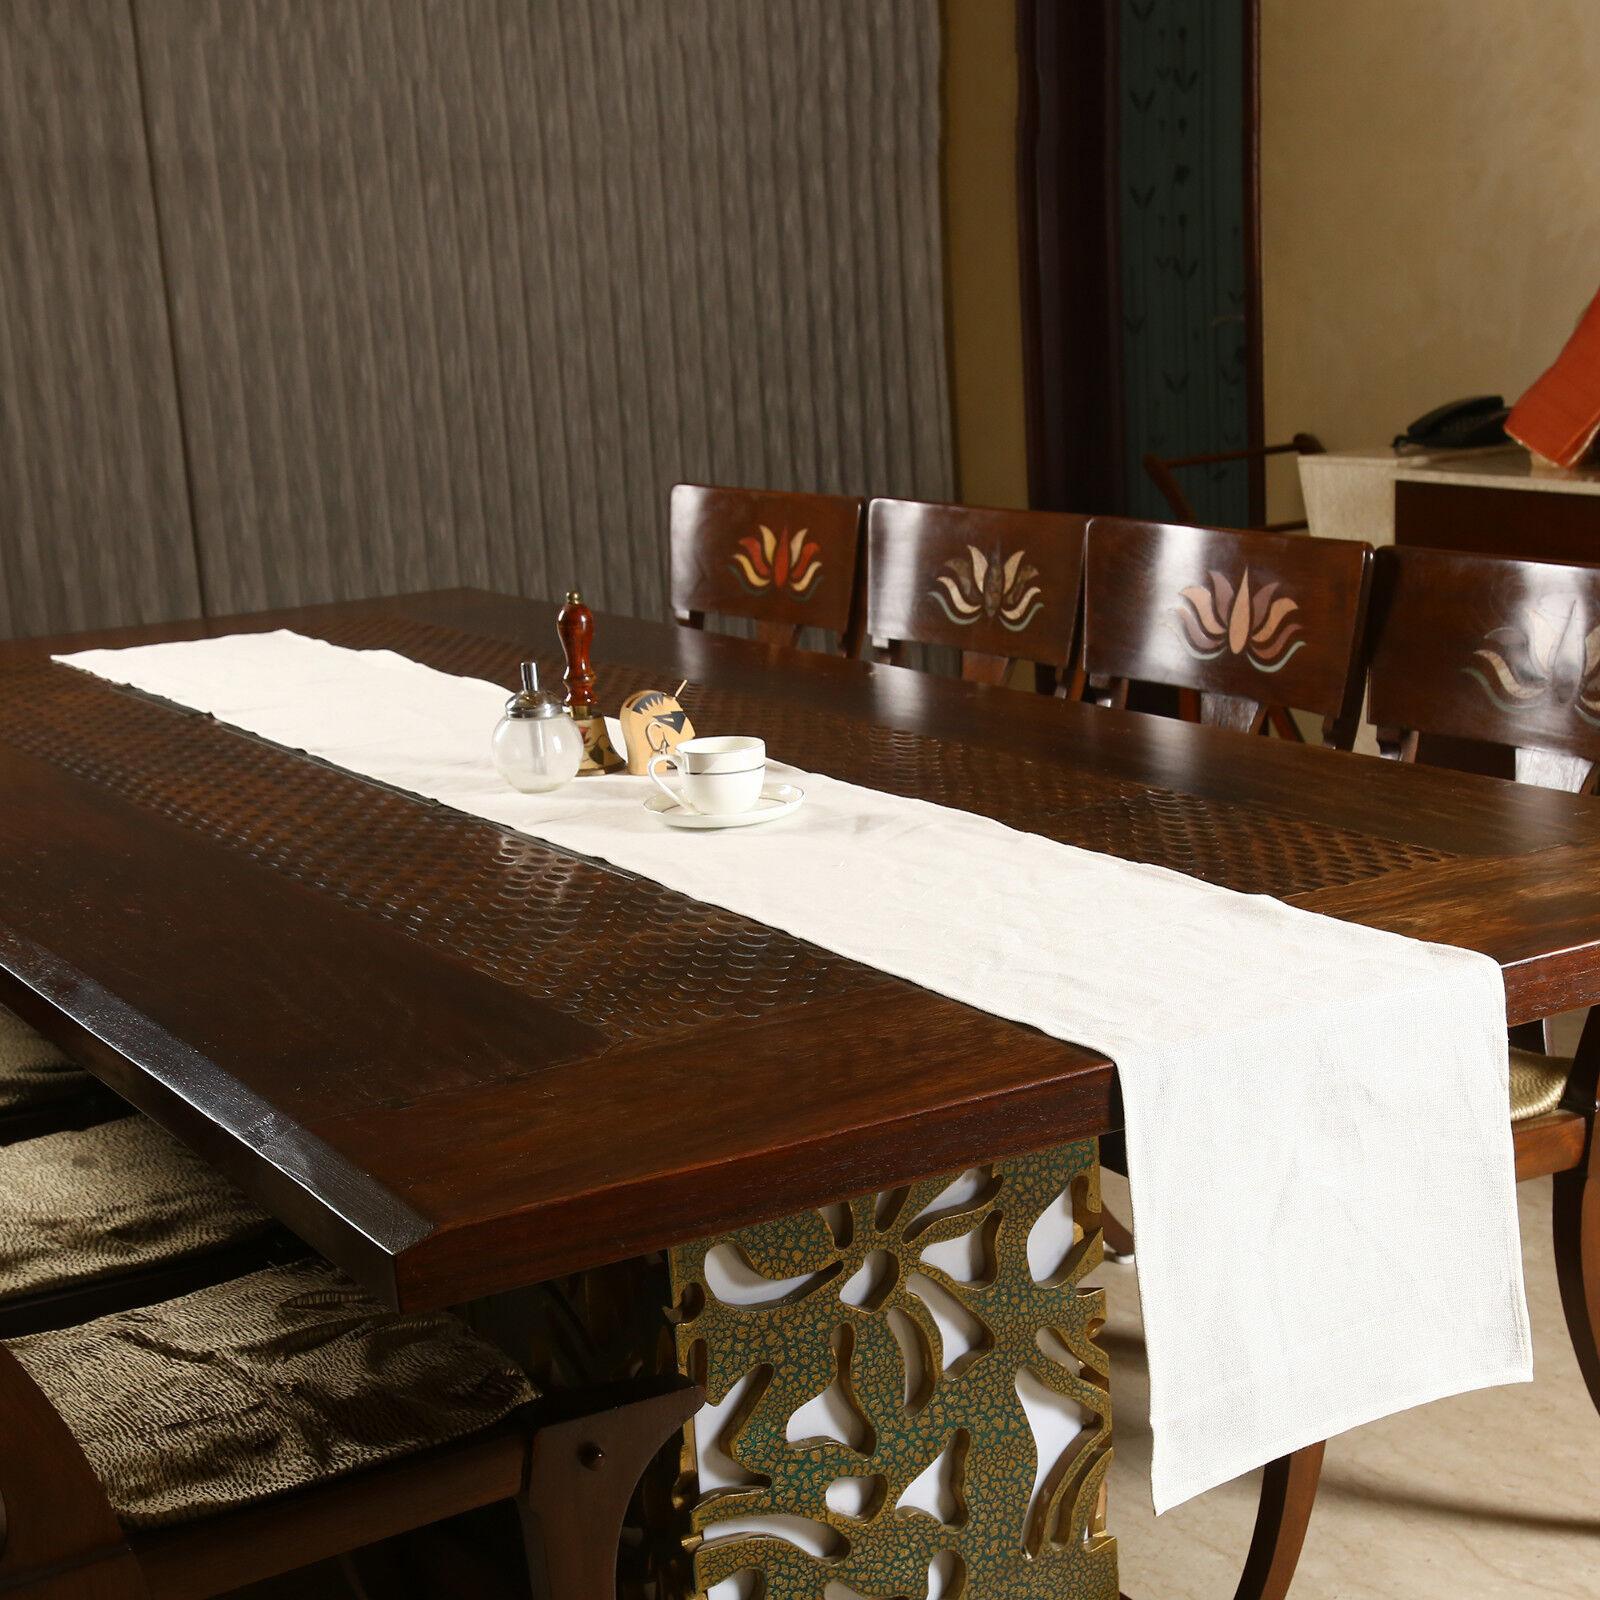 Handmade Linen Table Runner For Wedding Party Kitchen Dining